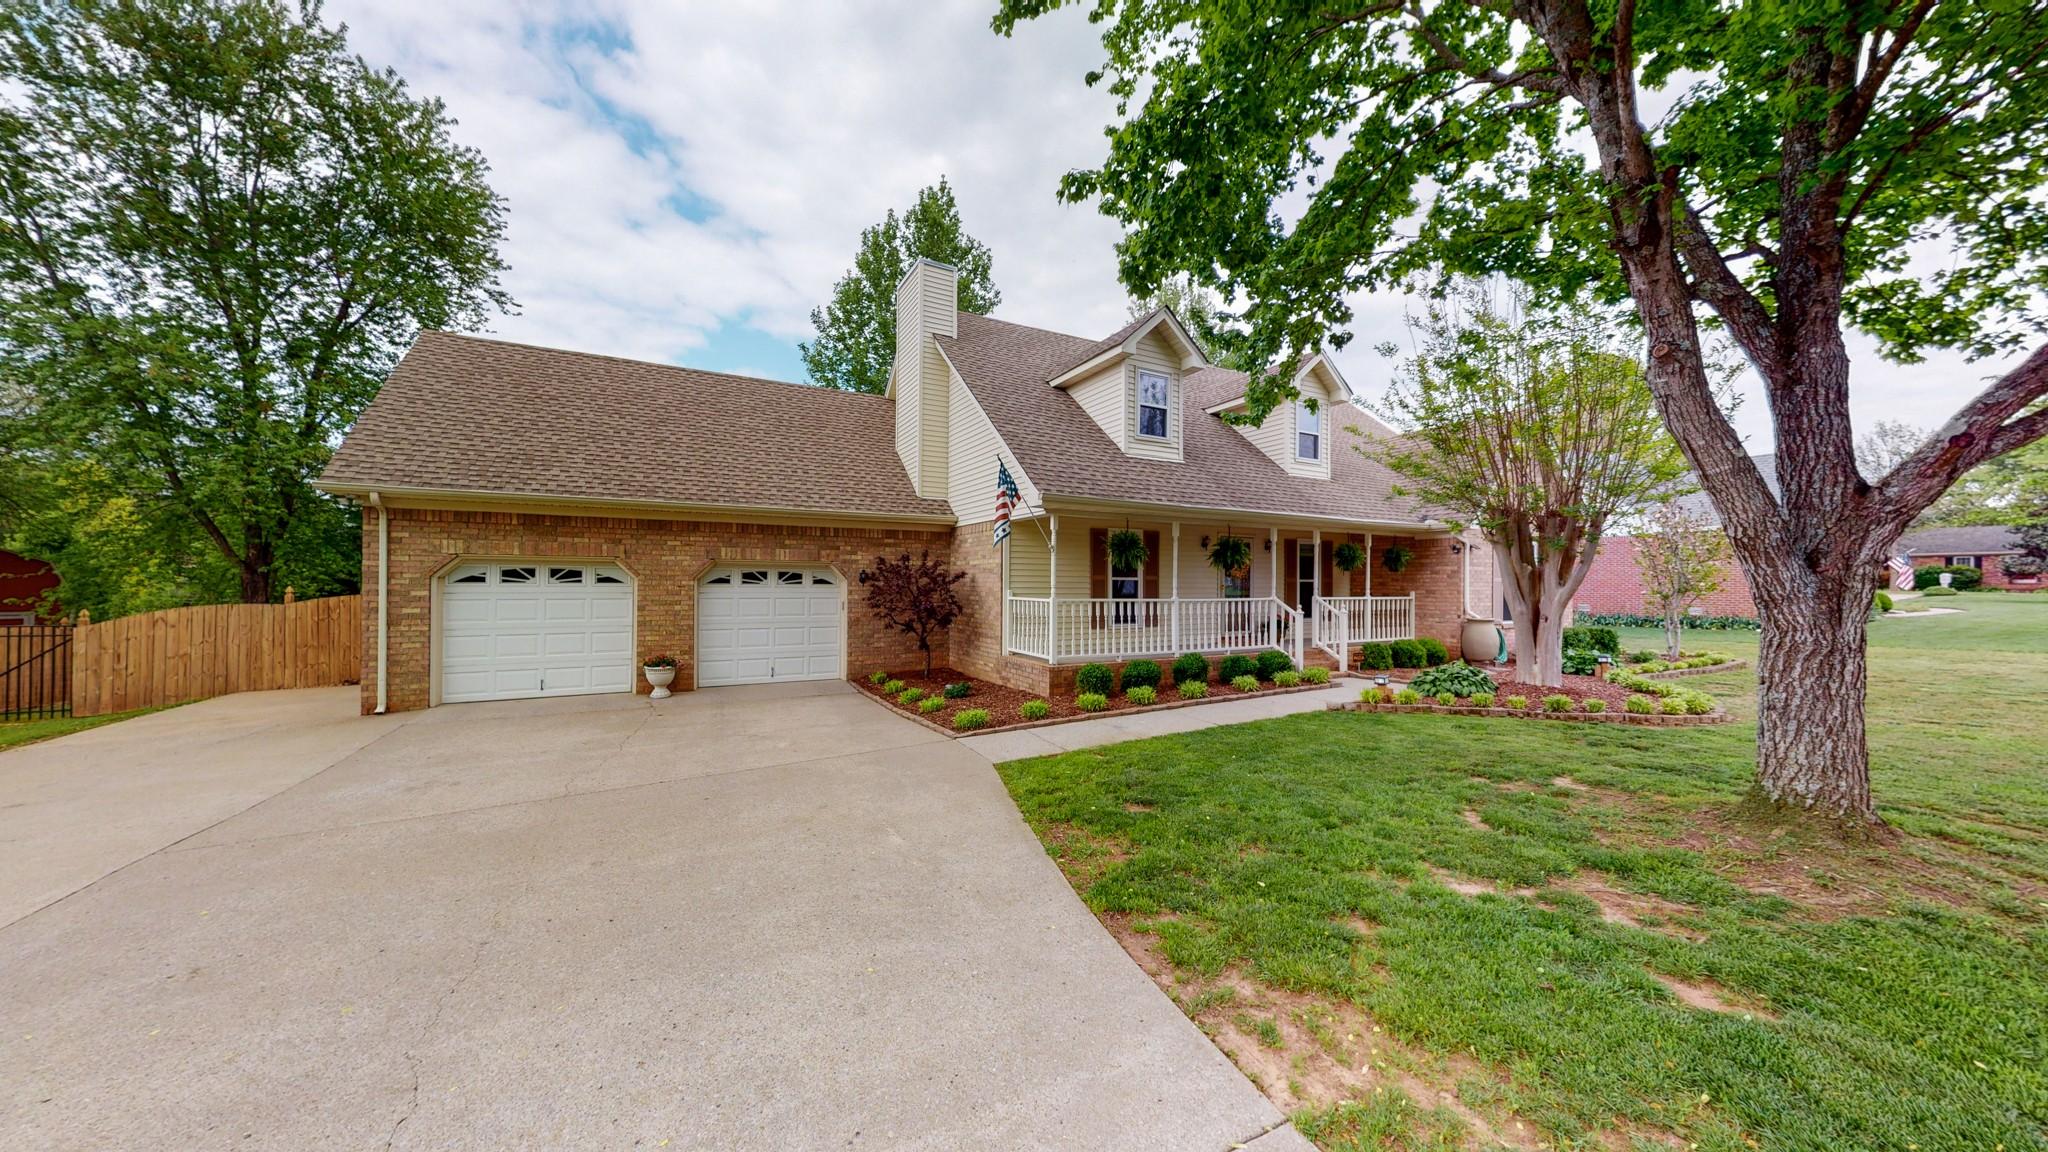 506 Brandywine Dr Property Photo - Murfreesboro, TN real estate listing